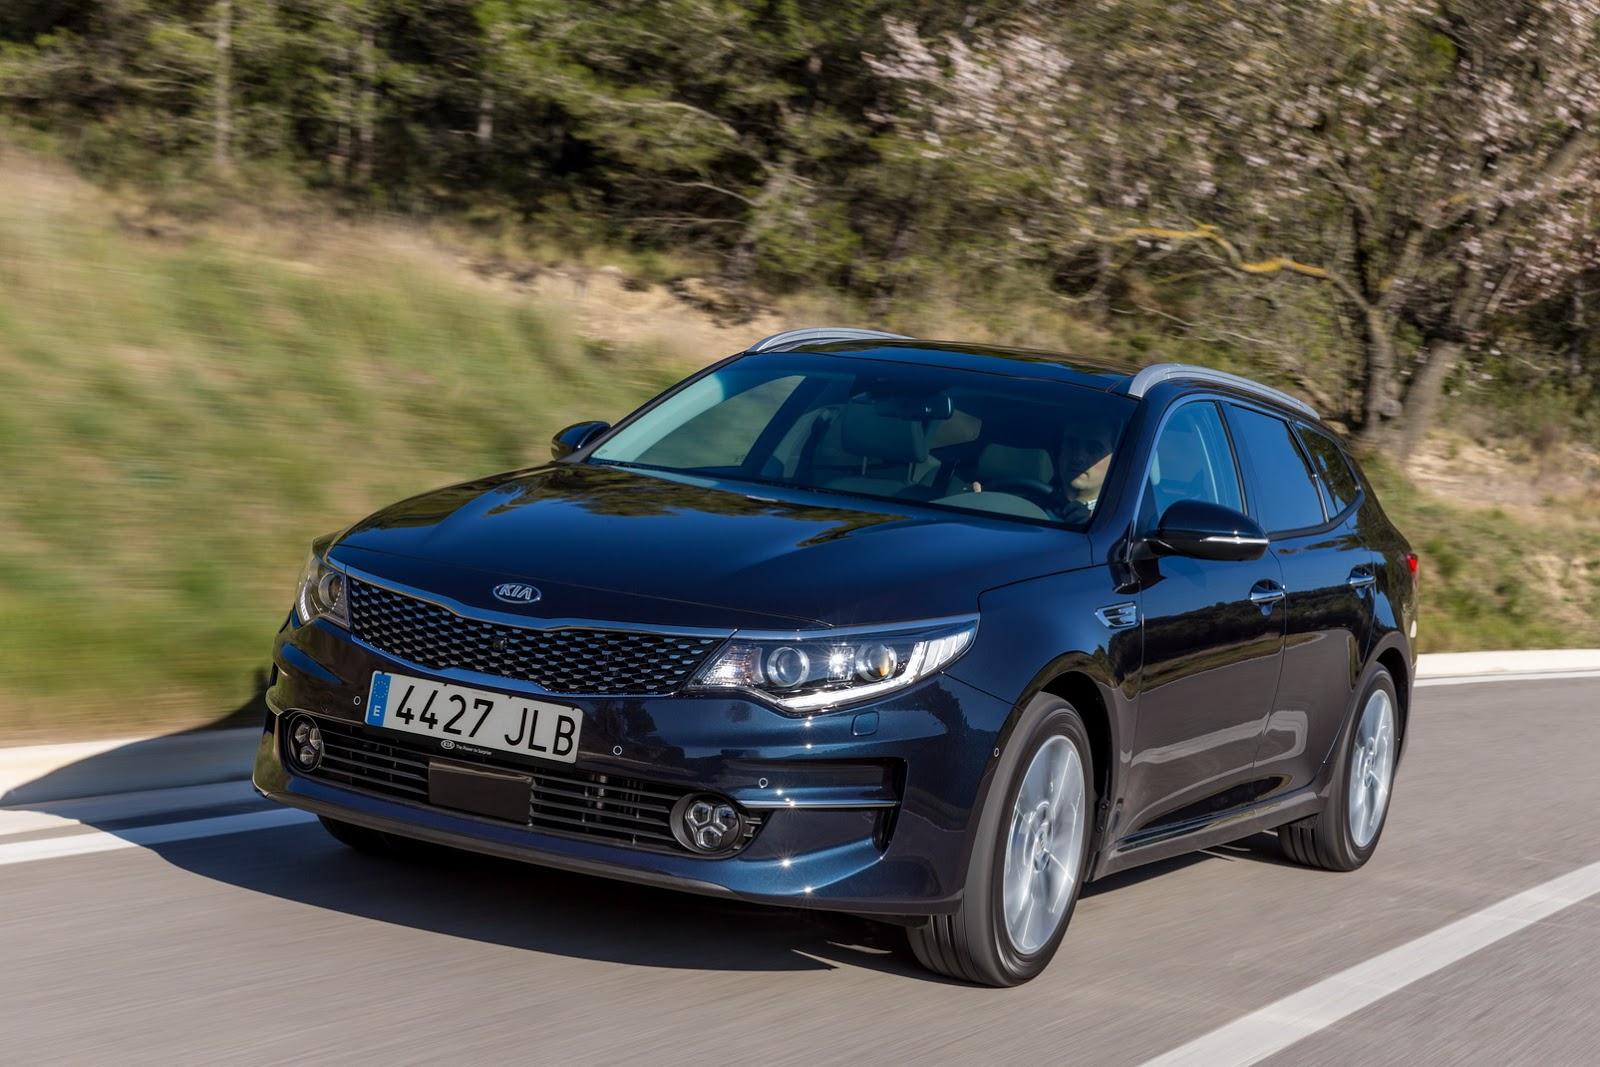 Kia Optima Sportswagon 2017 - Mẫu Wagon gợi tình nhất của Kia